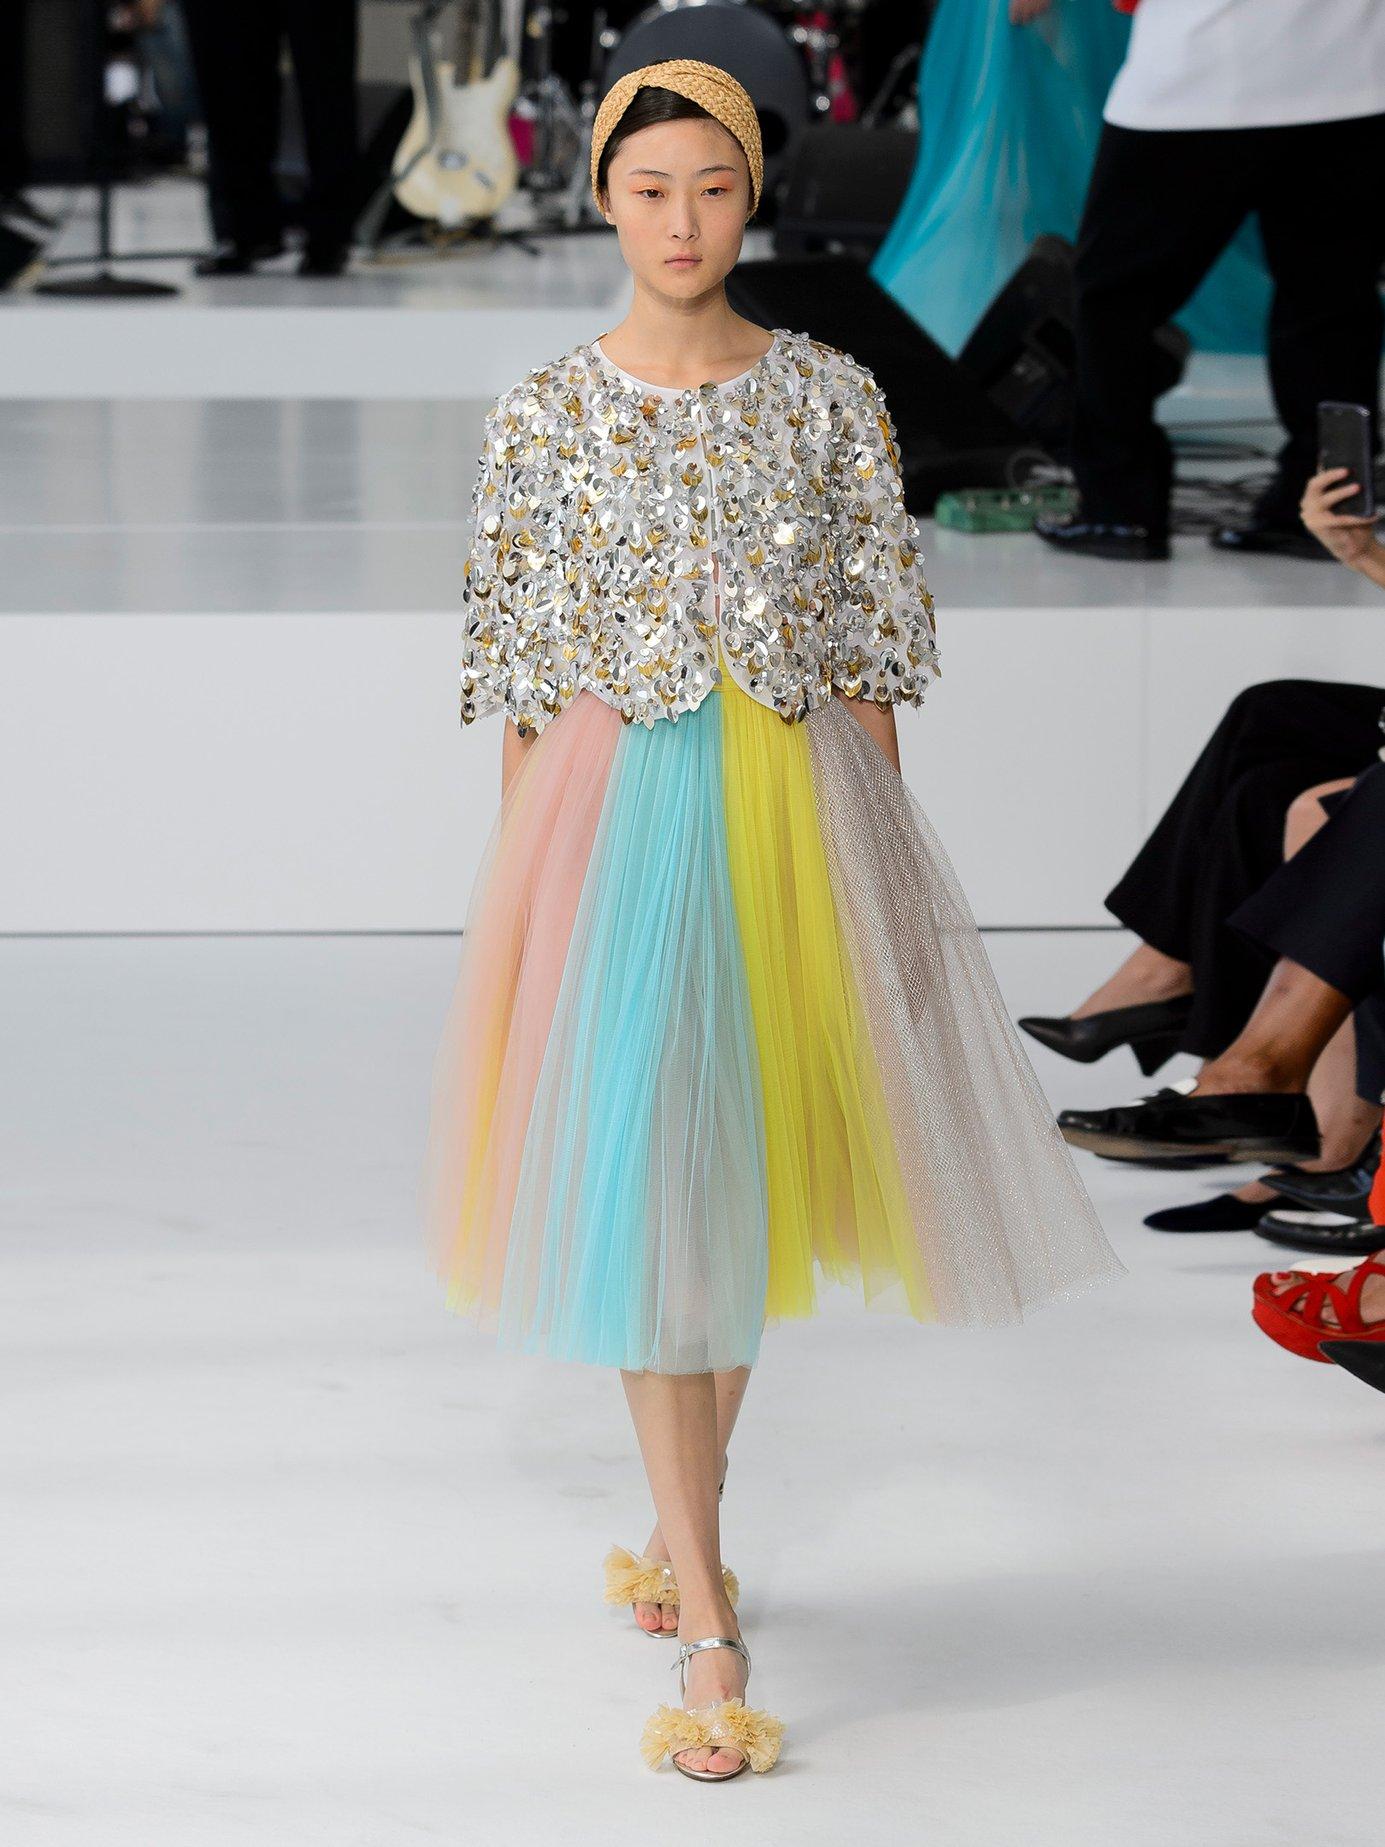 Multicoloured-striped tulle dress by Delpozo